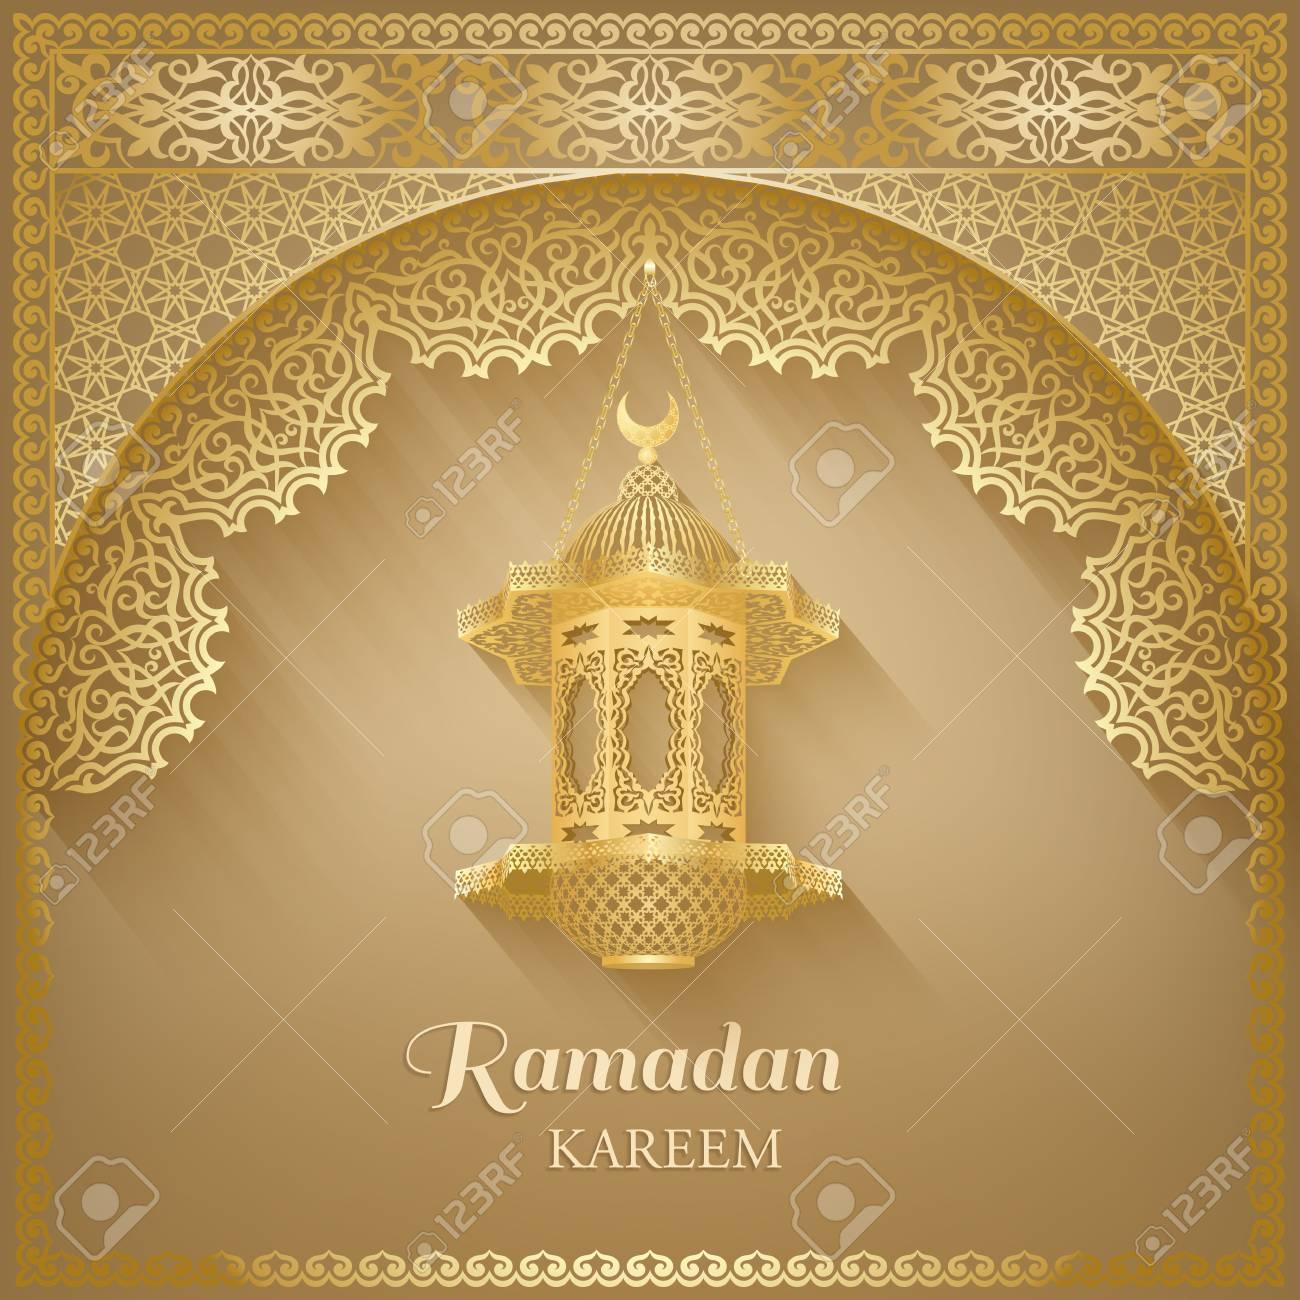 Ornate Vector Islamic Mosque Door, Vintage Lantern For Ramadan Wishing.  Arabic Ornamental Lamps.